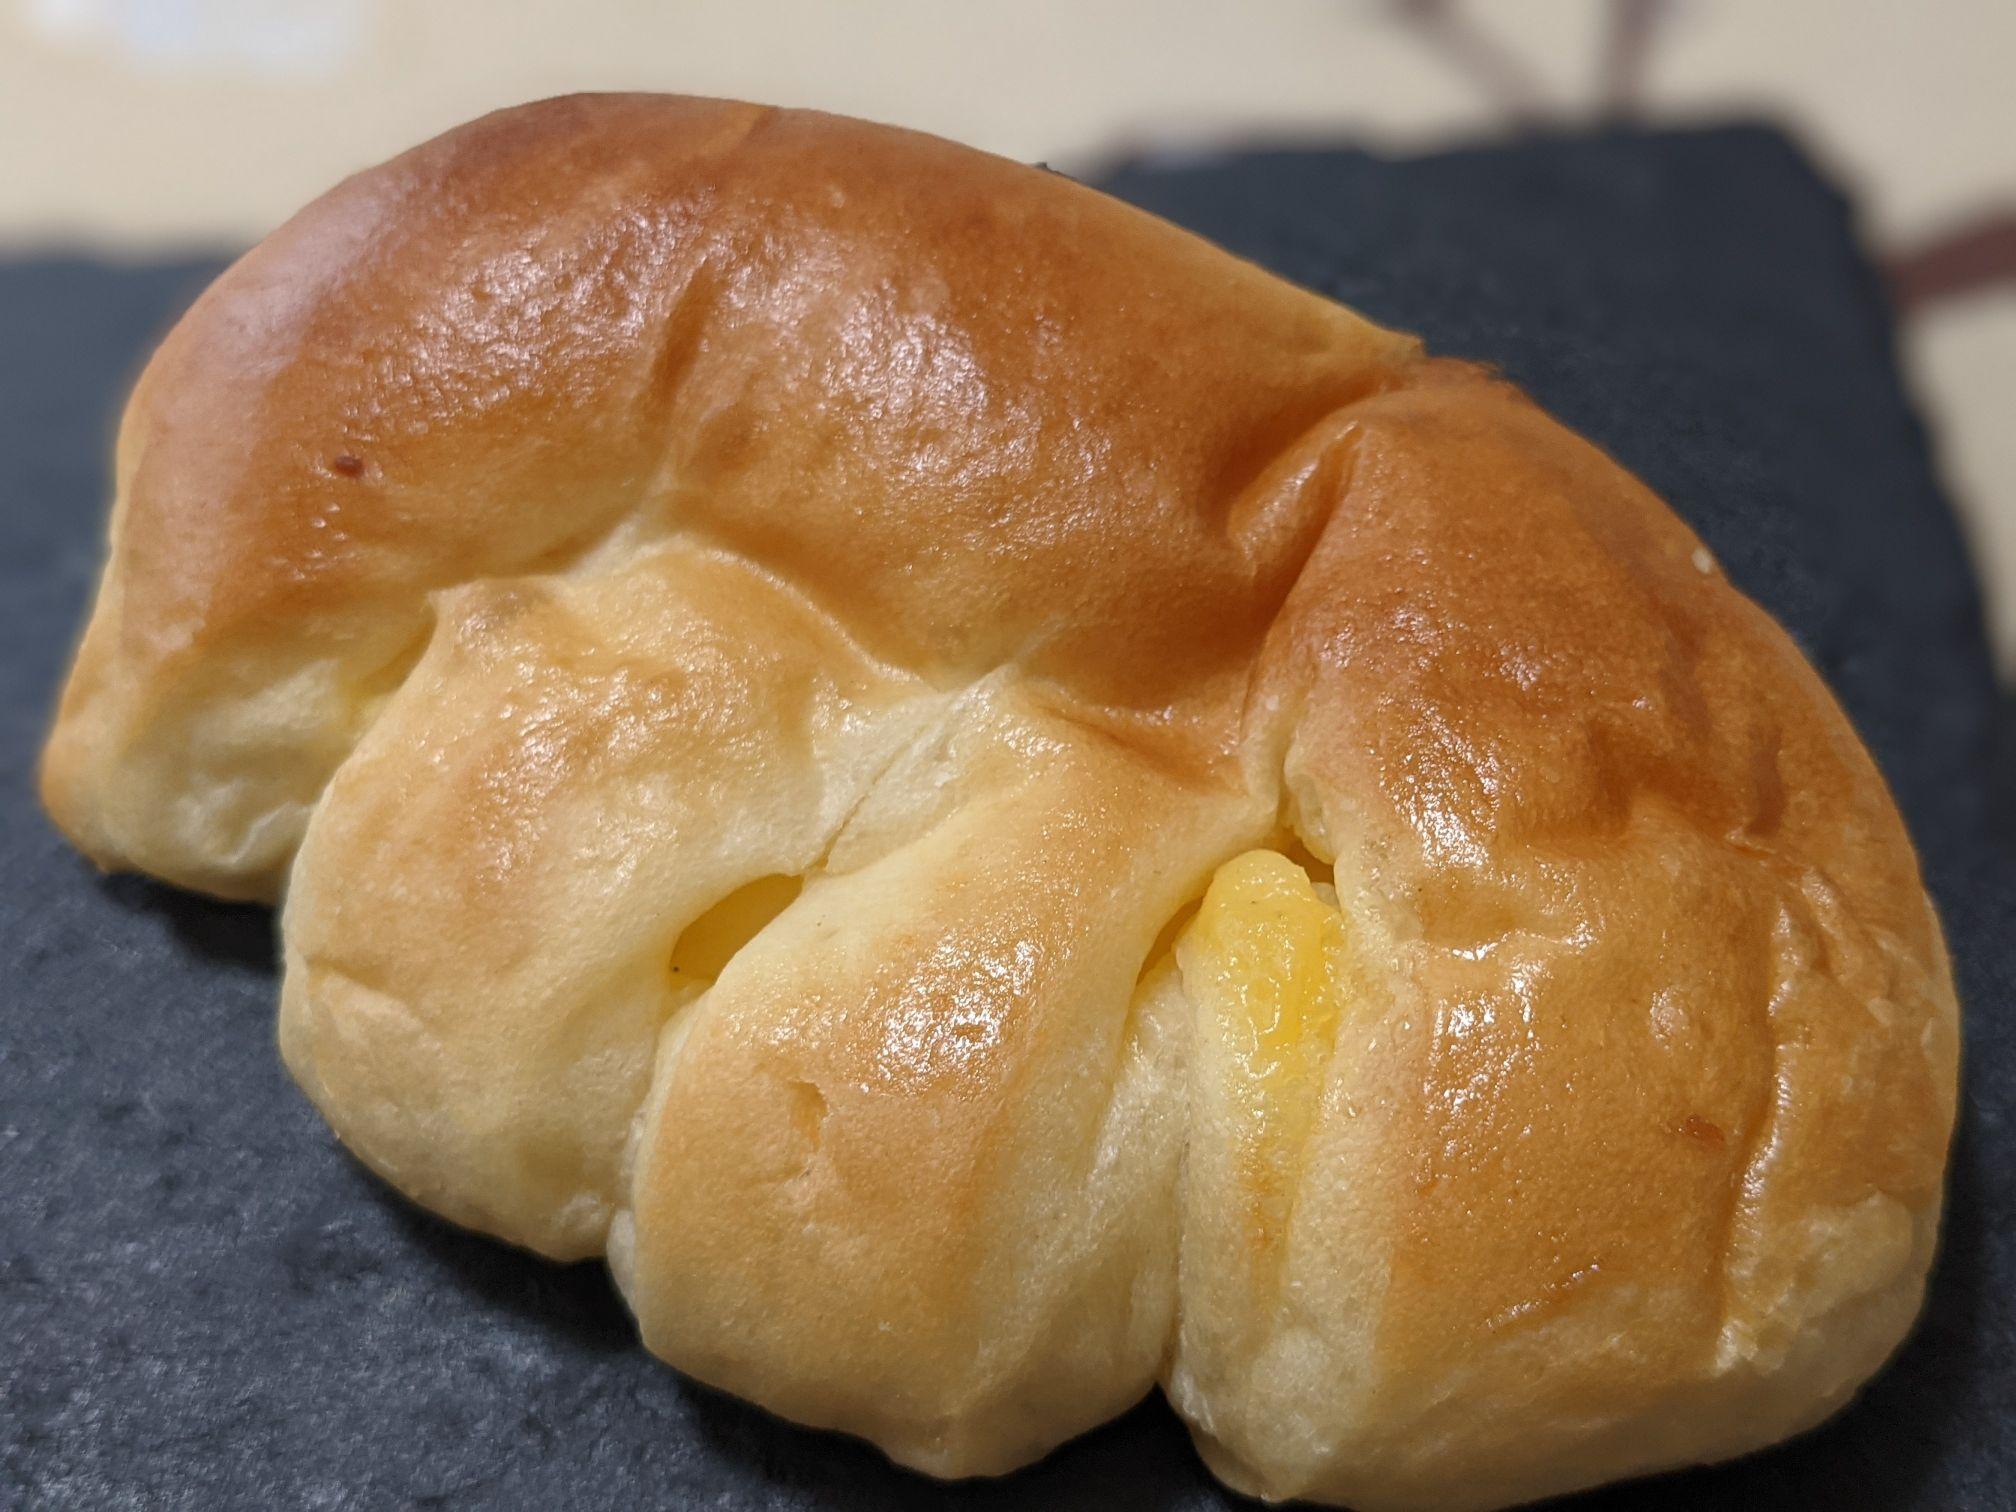 PICASSO(ピカソ)烏森本店の黄金のクリームパン